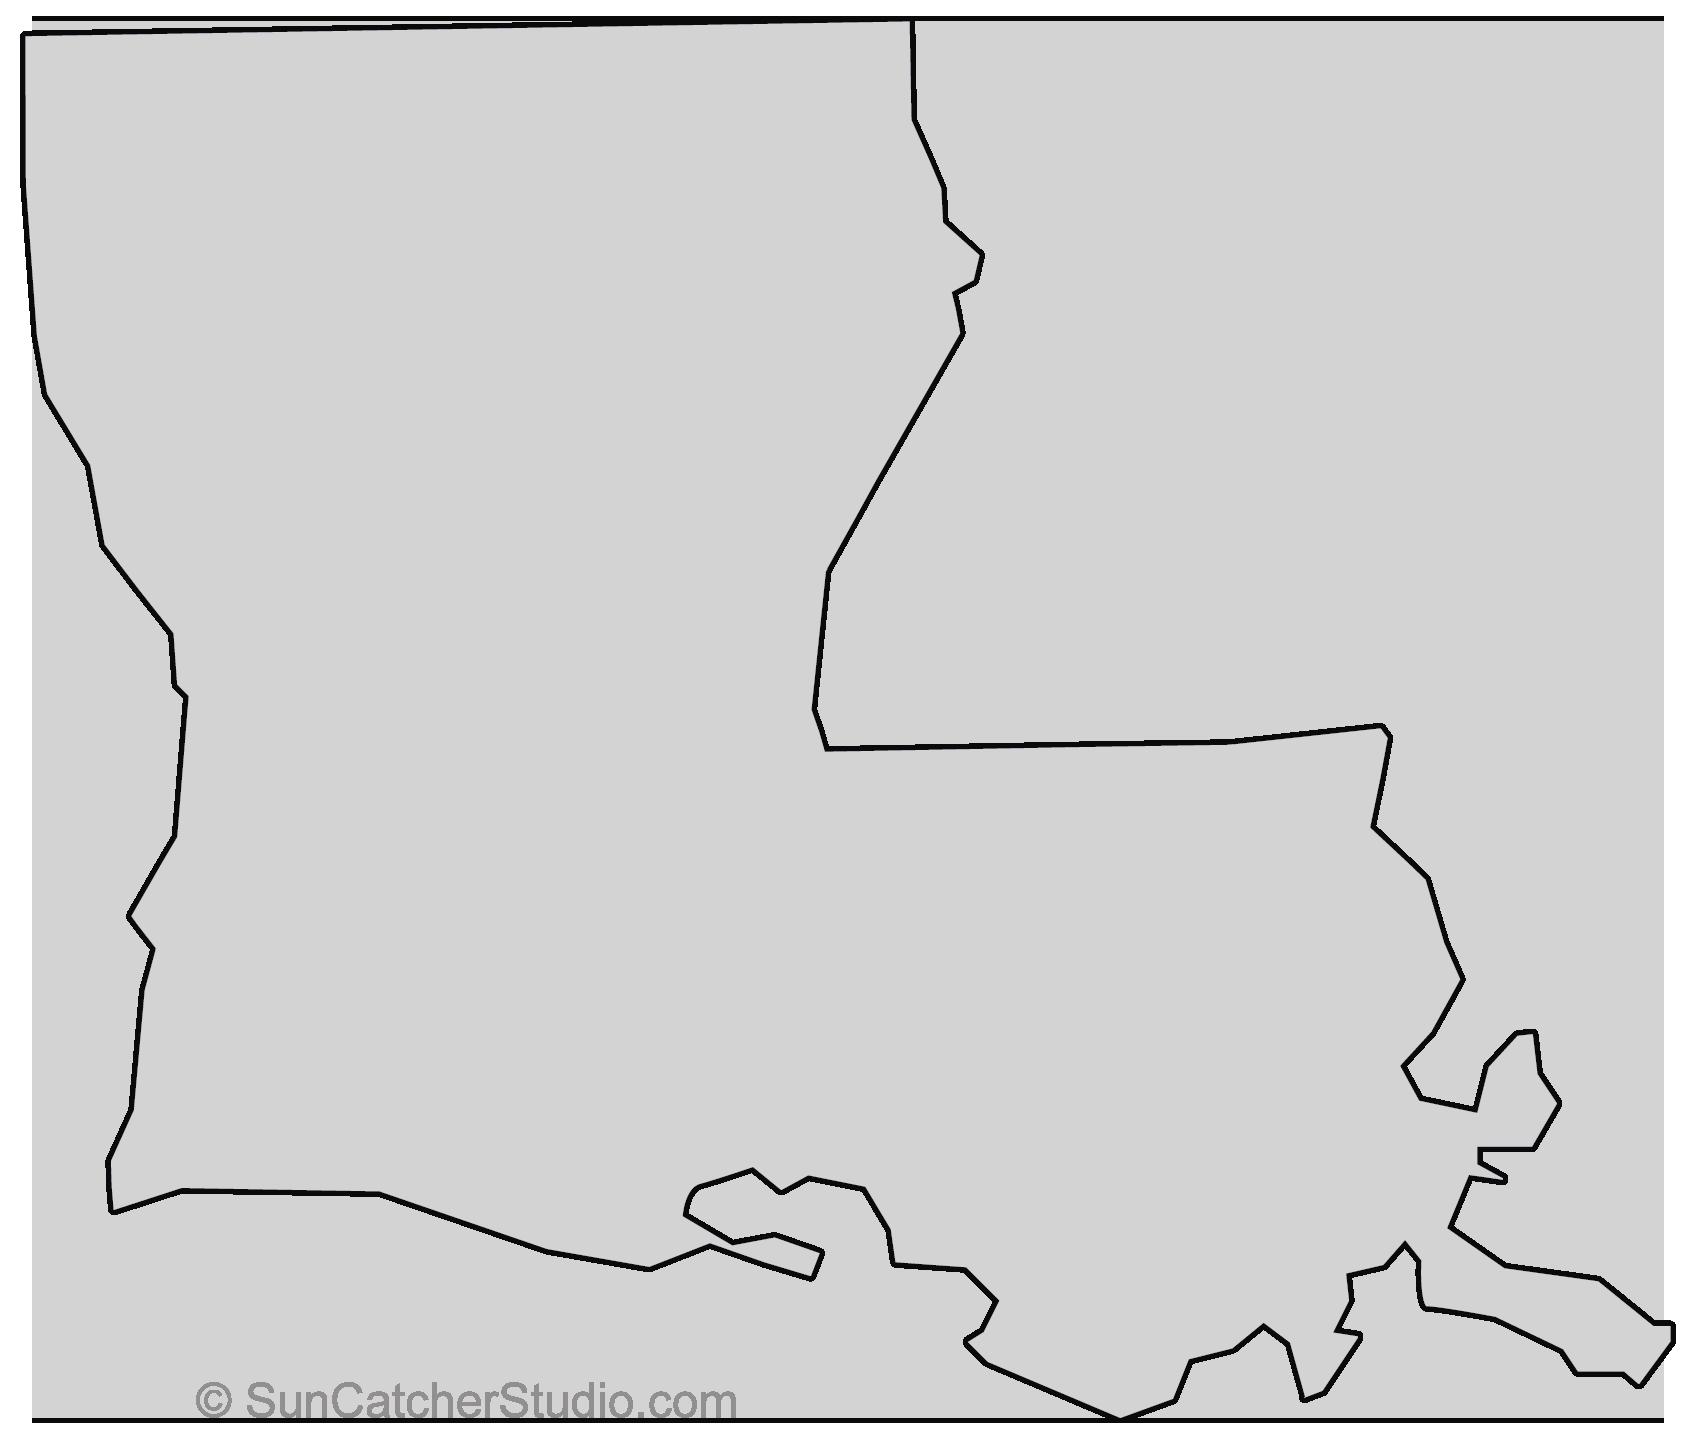 Louisiana clipart state, Louisiana state Transparent FREE ...